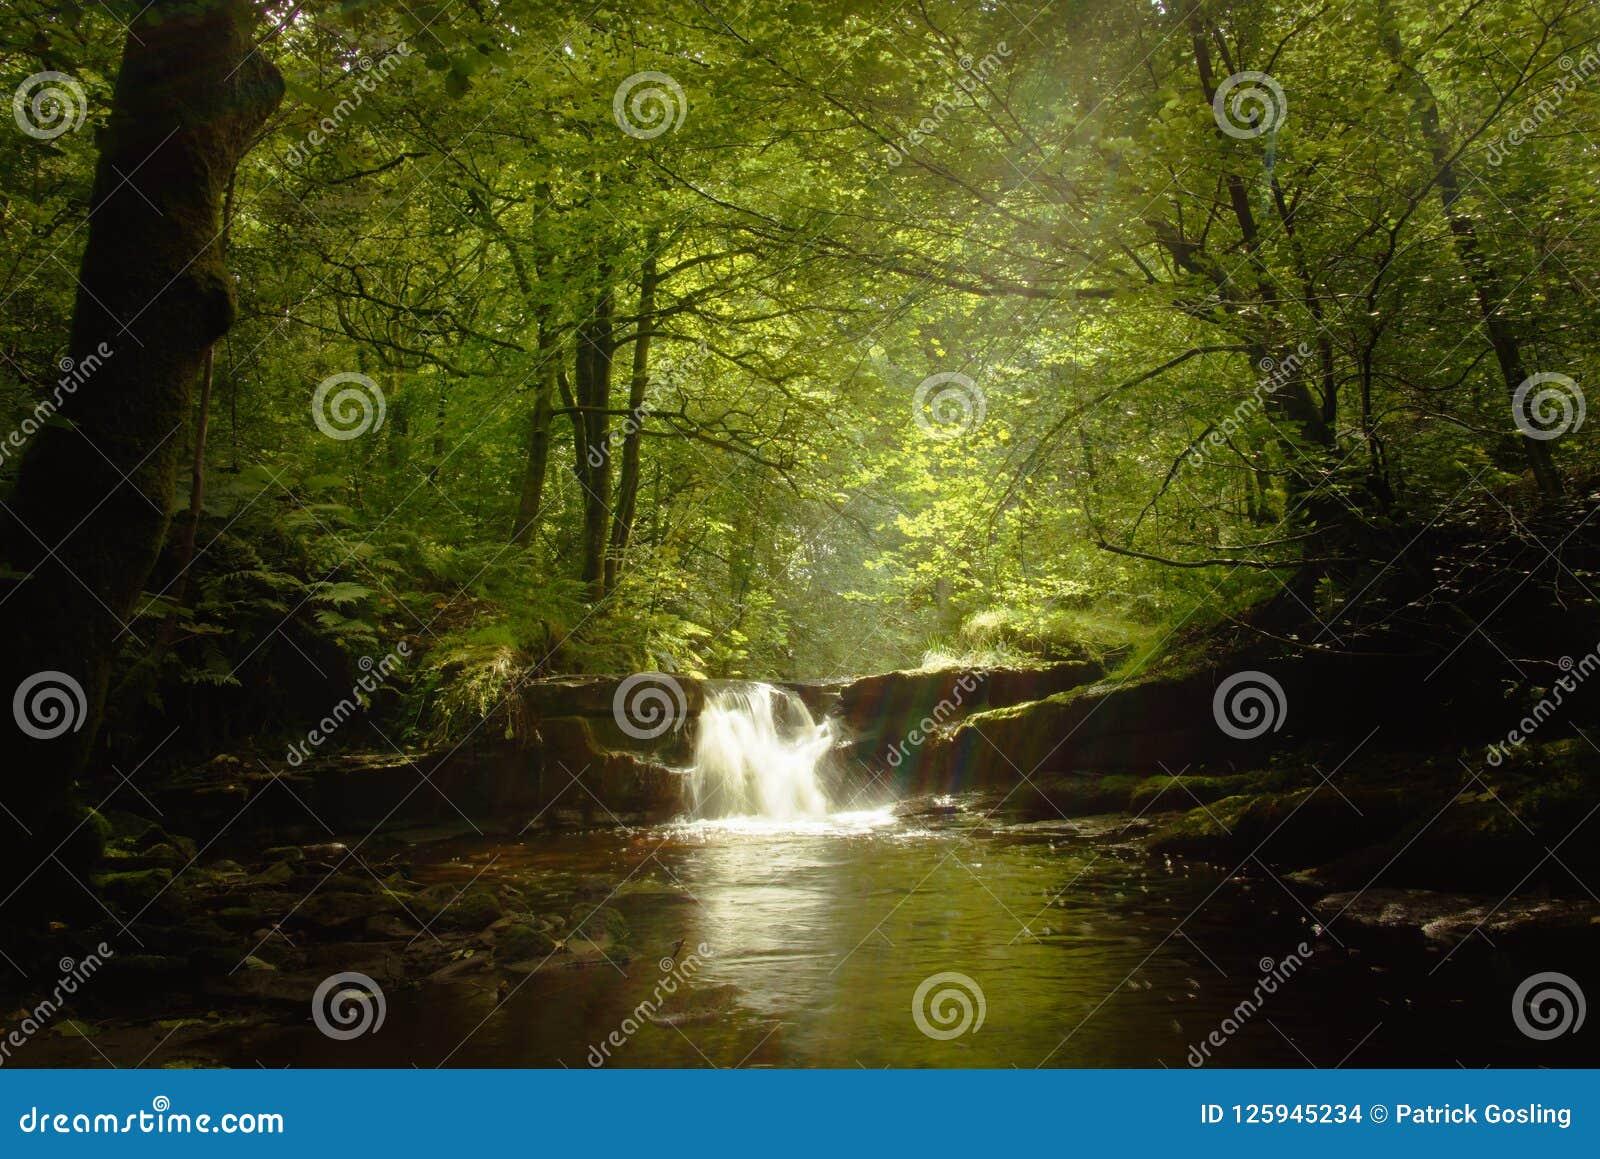 Waterfall after rain.